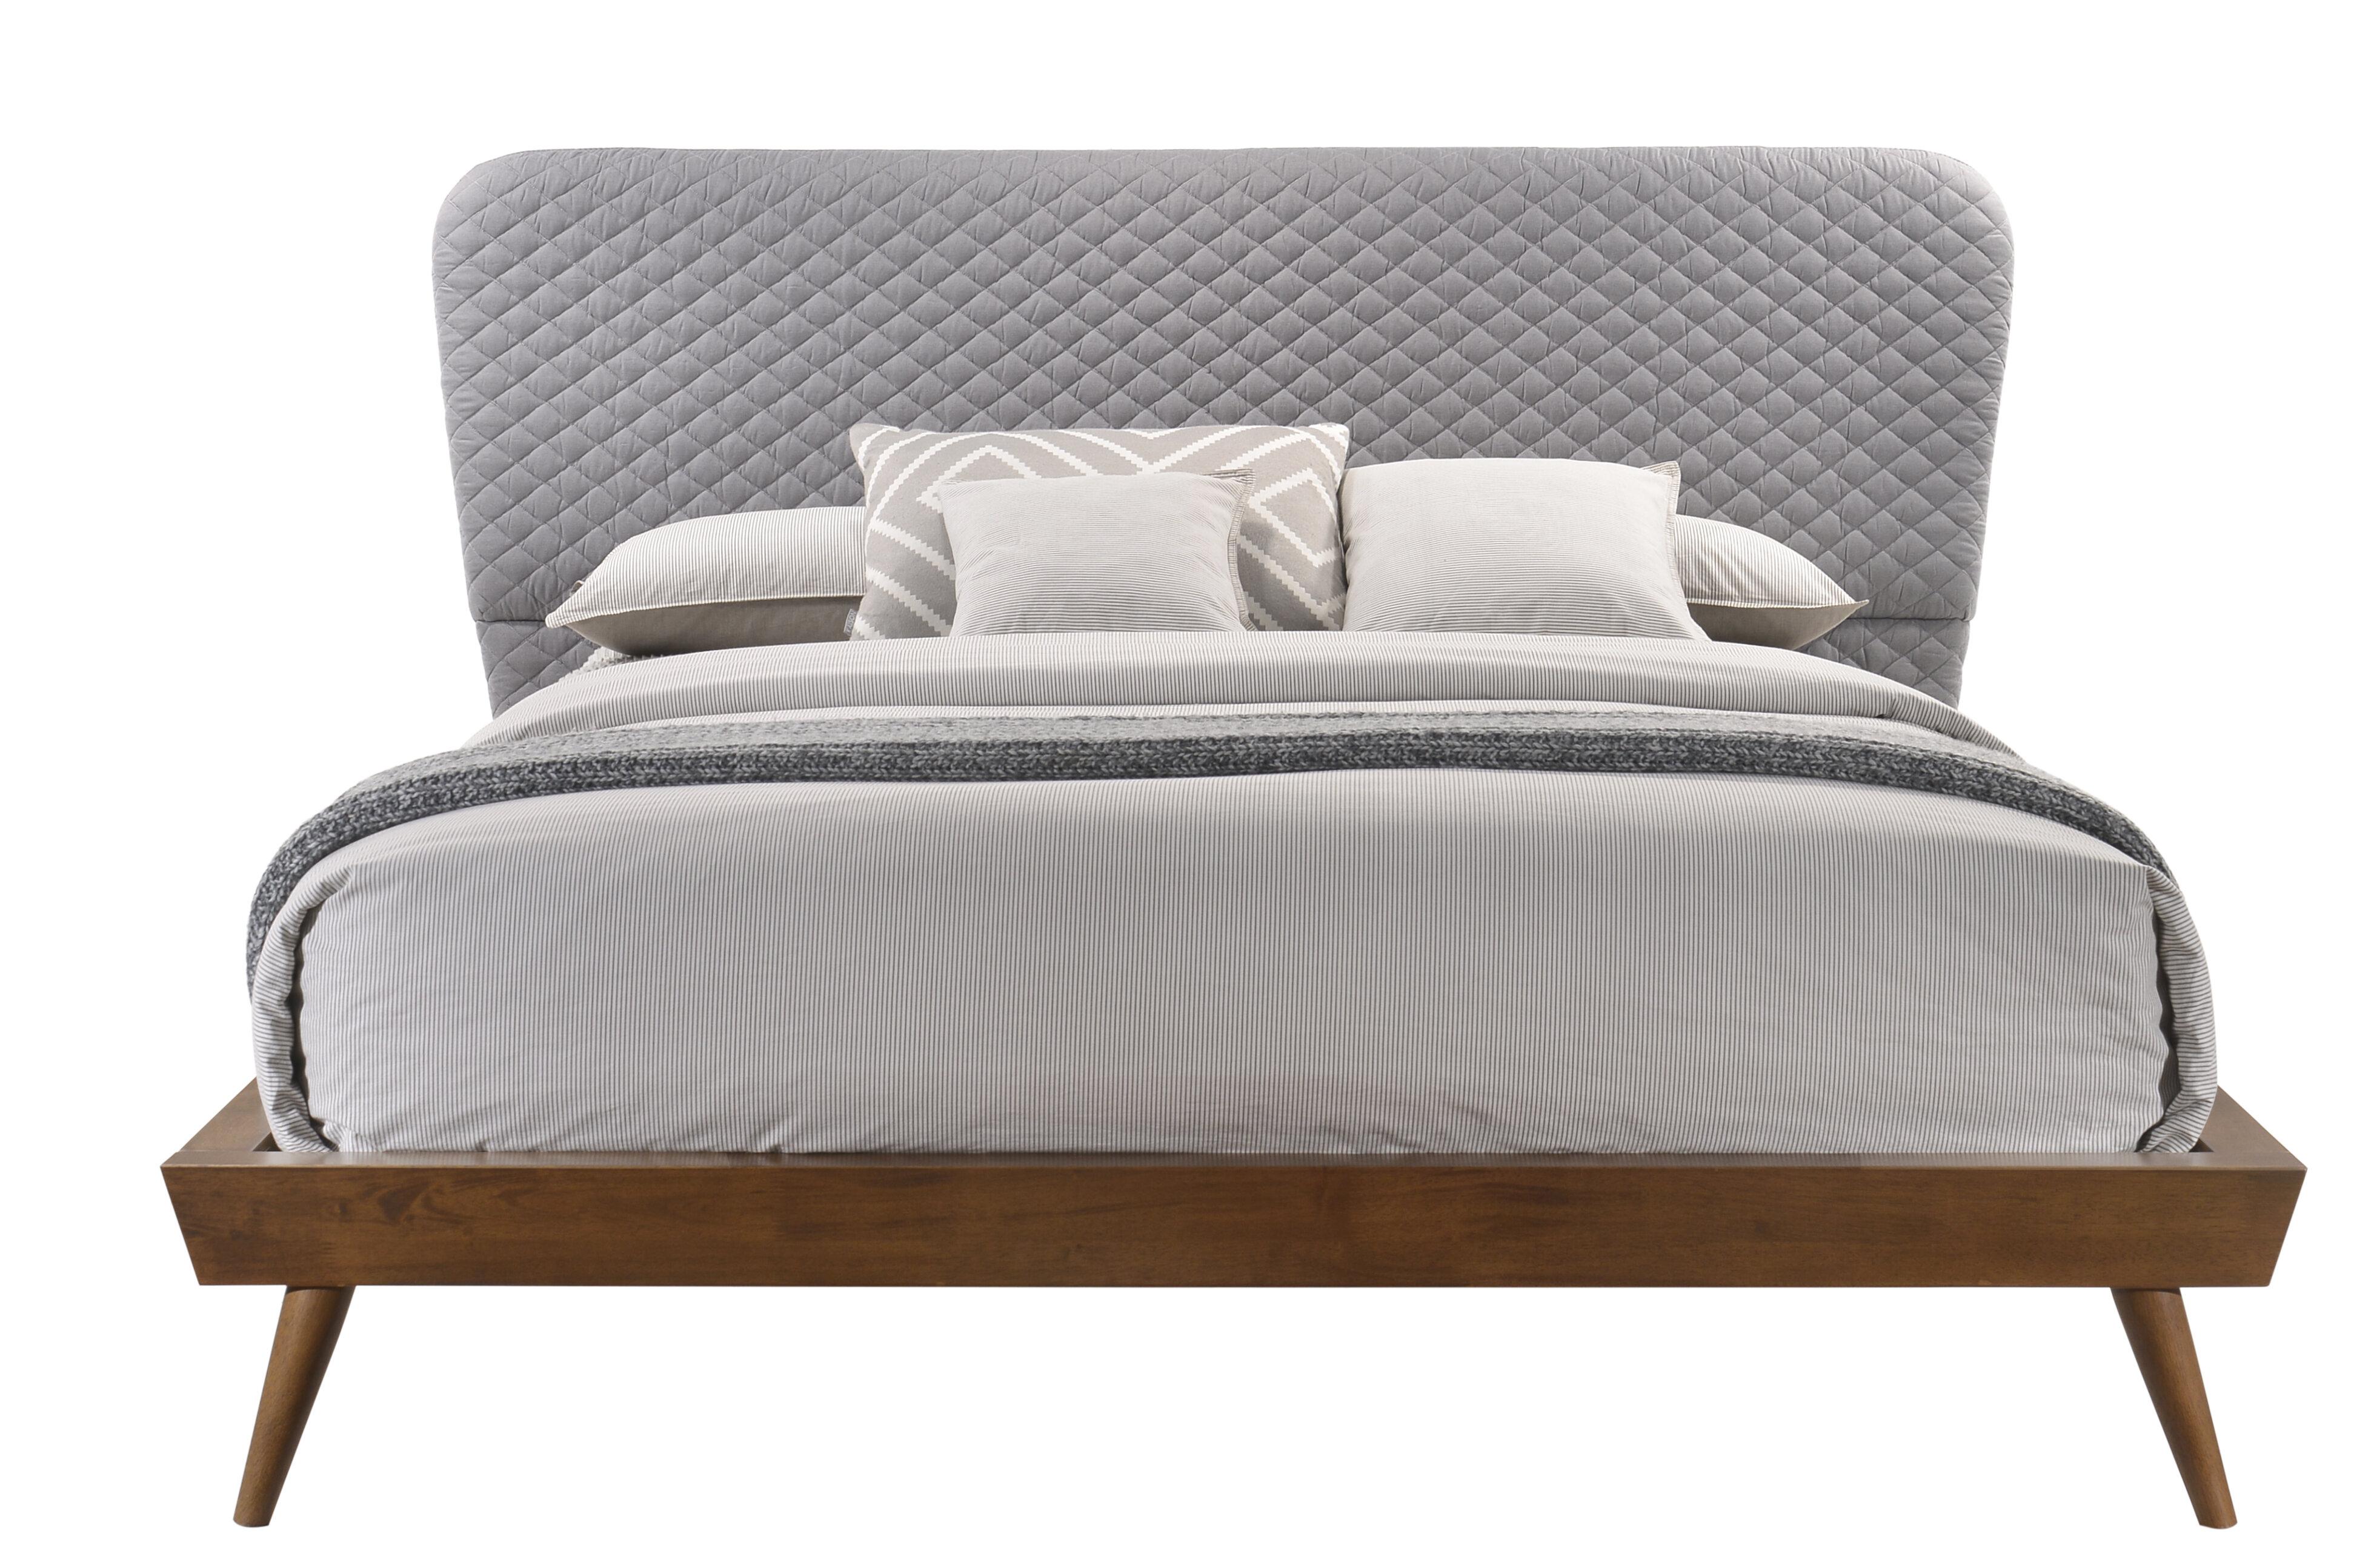 mid century wood bed